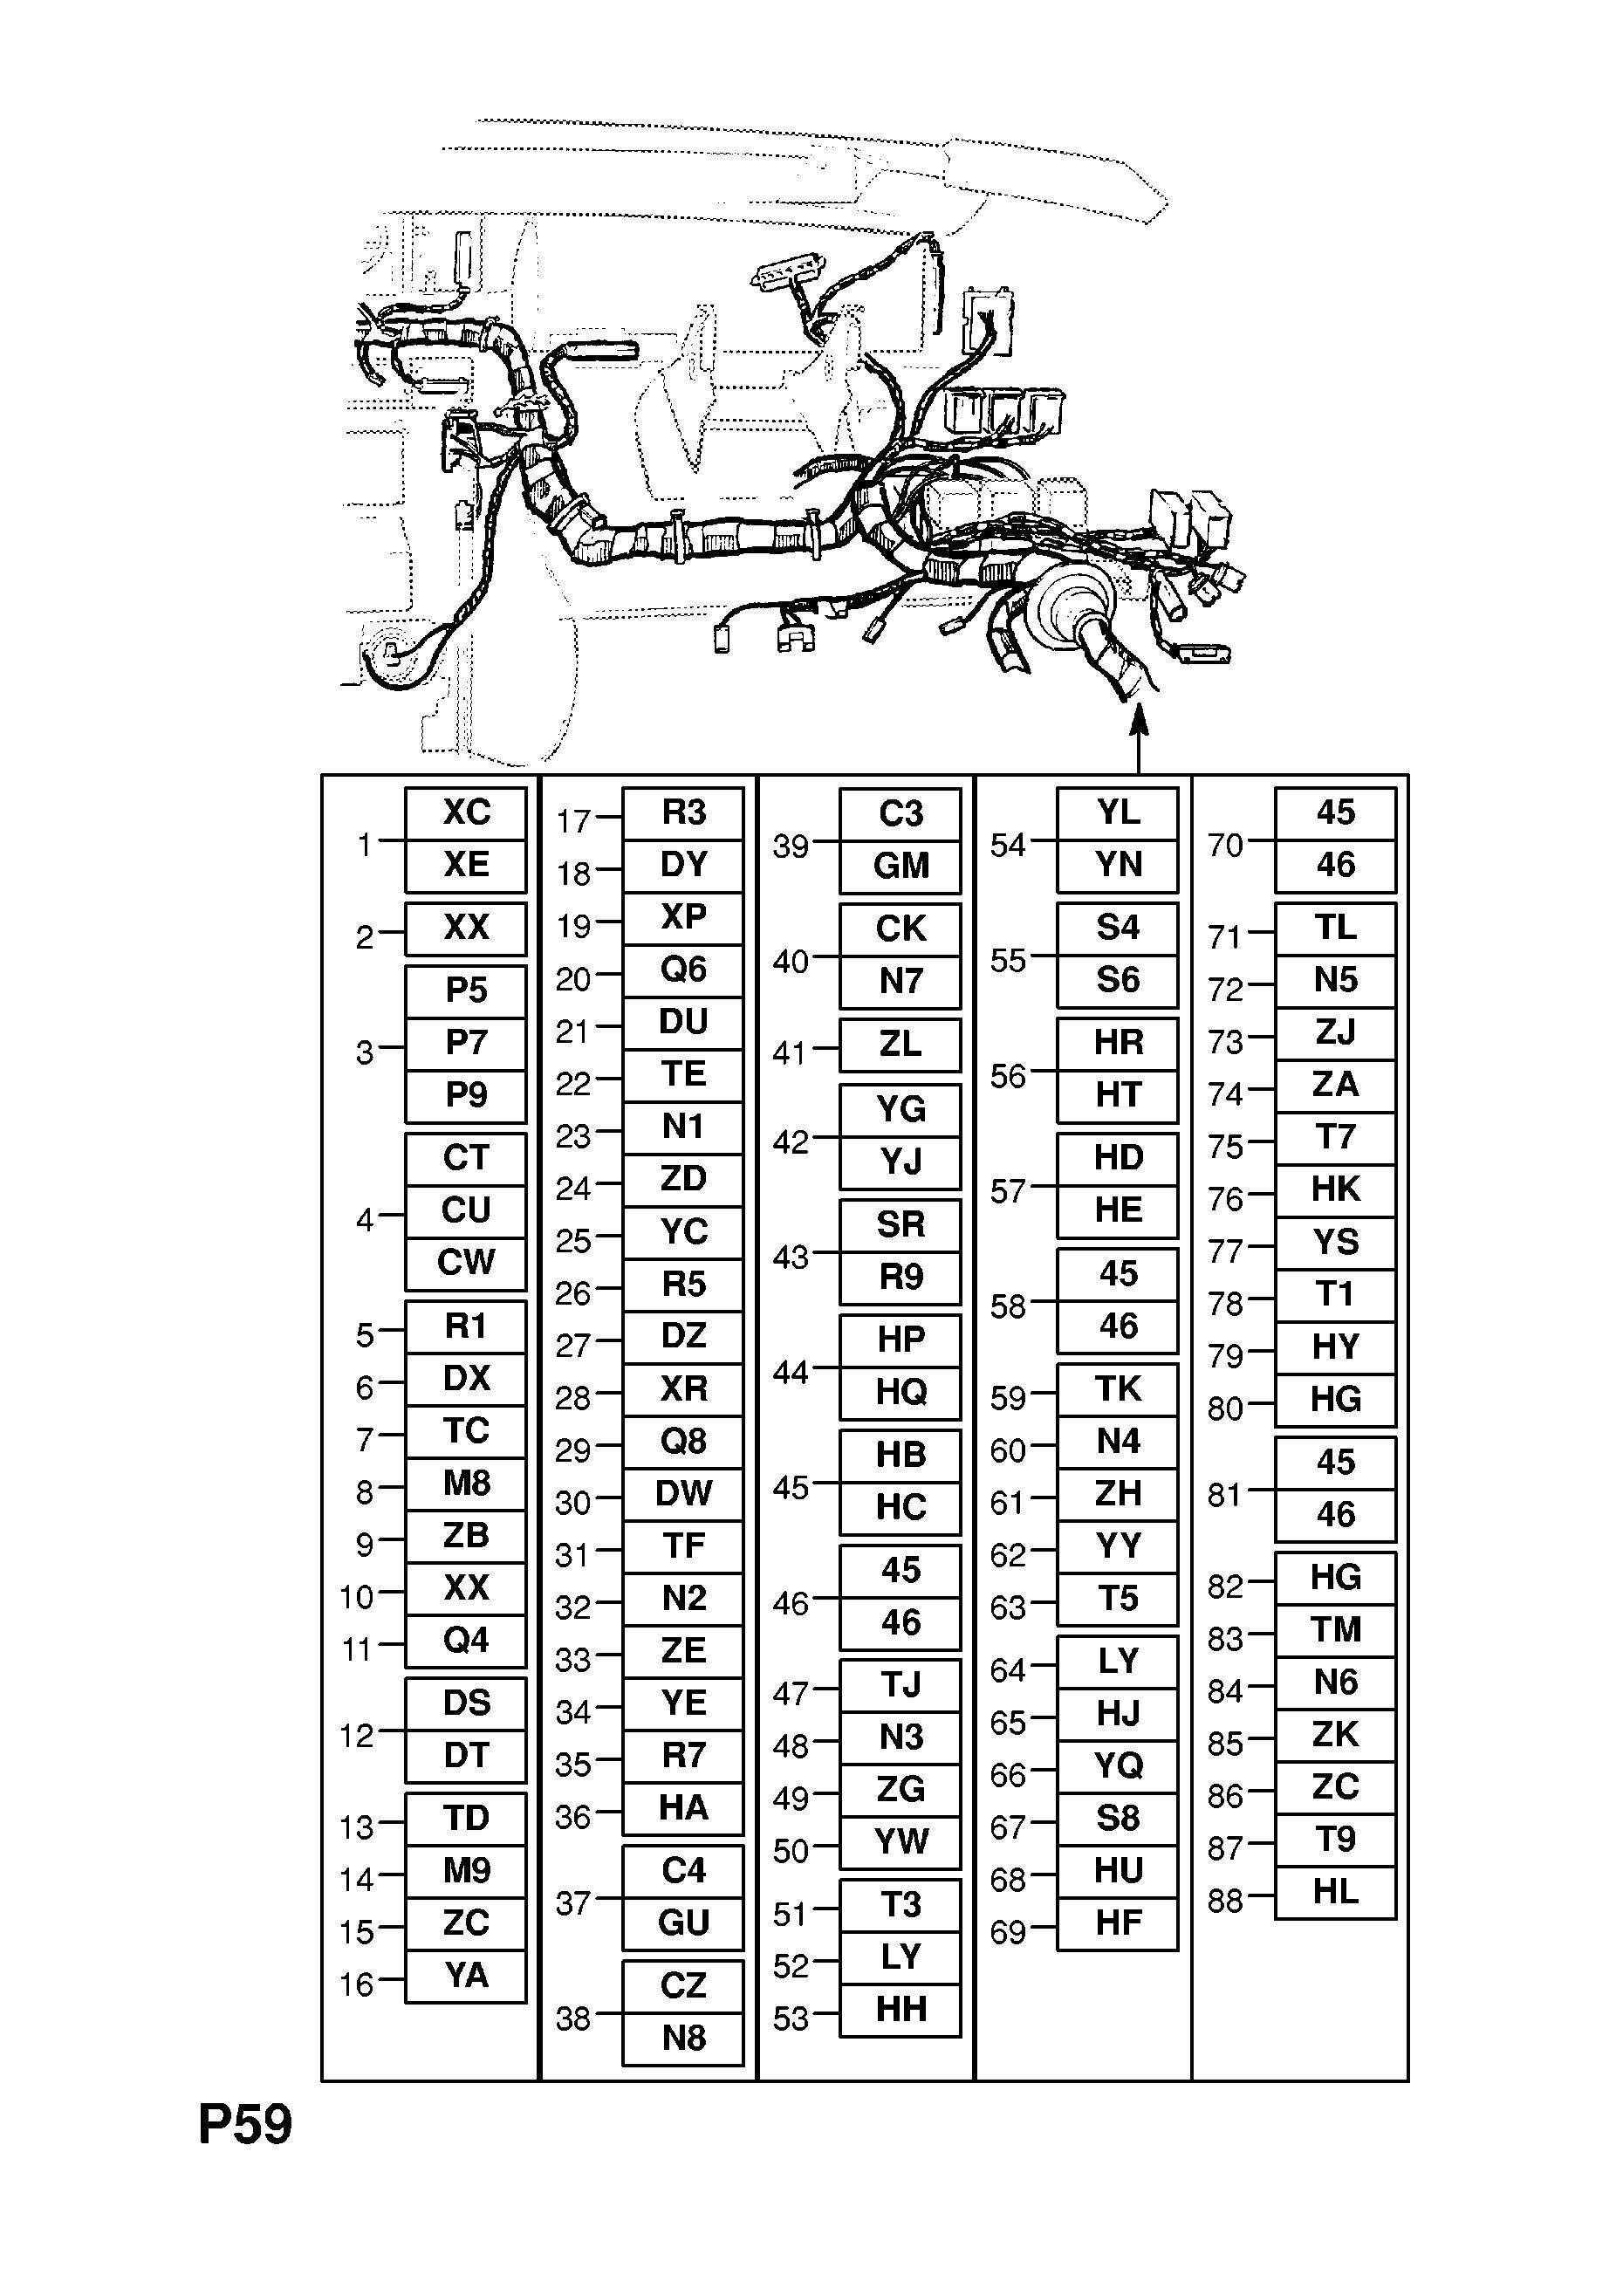 Opel Senator B 1988 1994 P Electrical 10 Wiring Harness 47 Zc Gm Part Number Genuine Description Range Instrument Panel